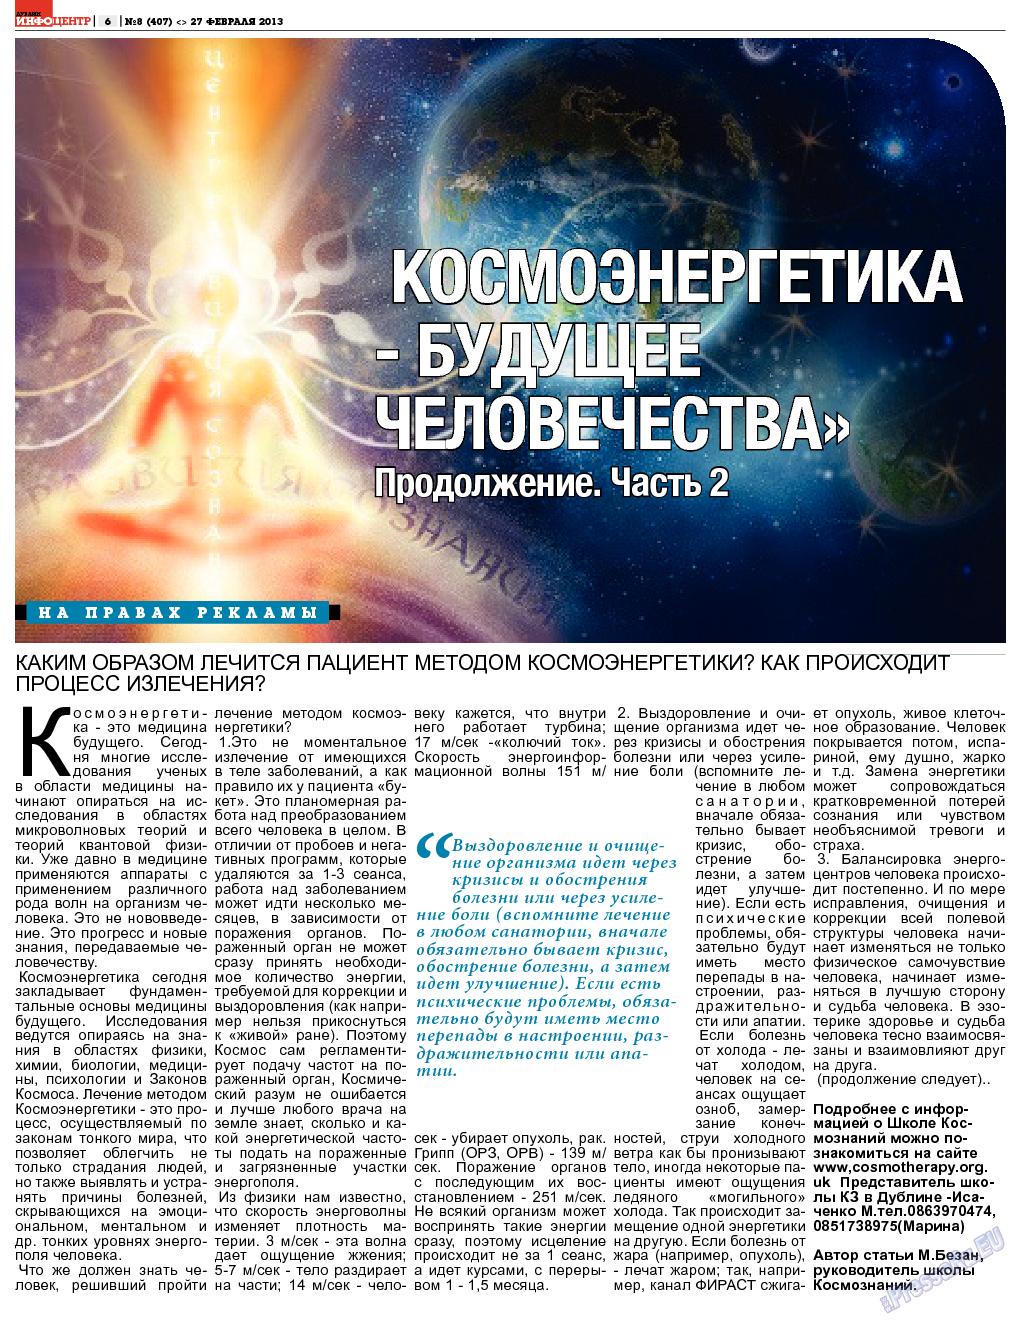 Дублин инфоцентр (газета). 2013 год, номер 8, стр. 6